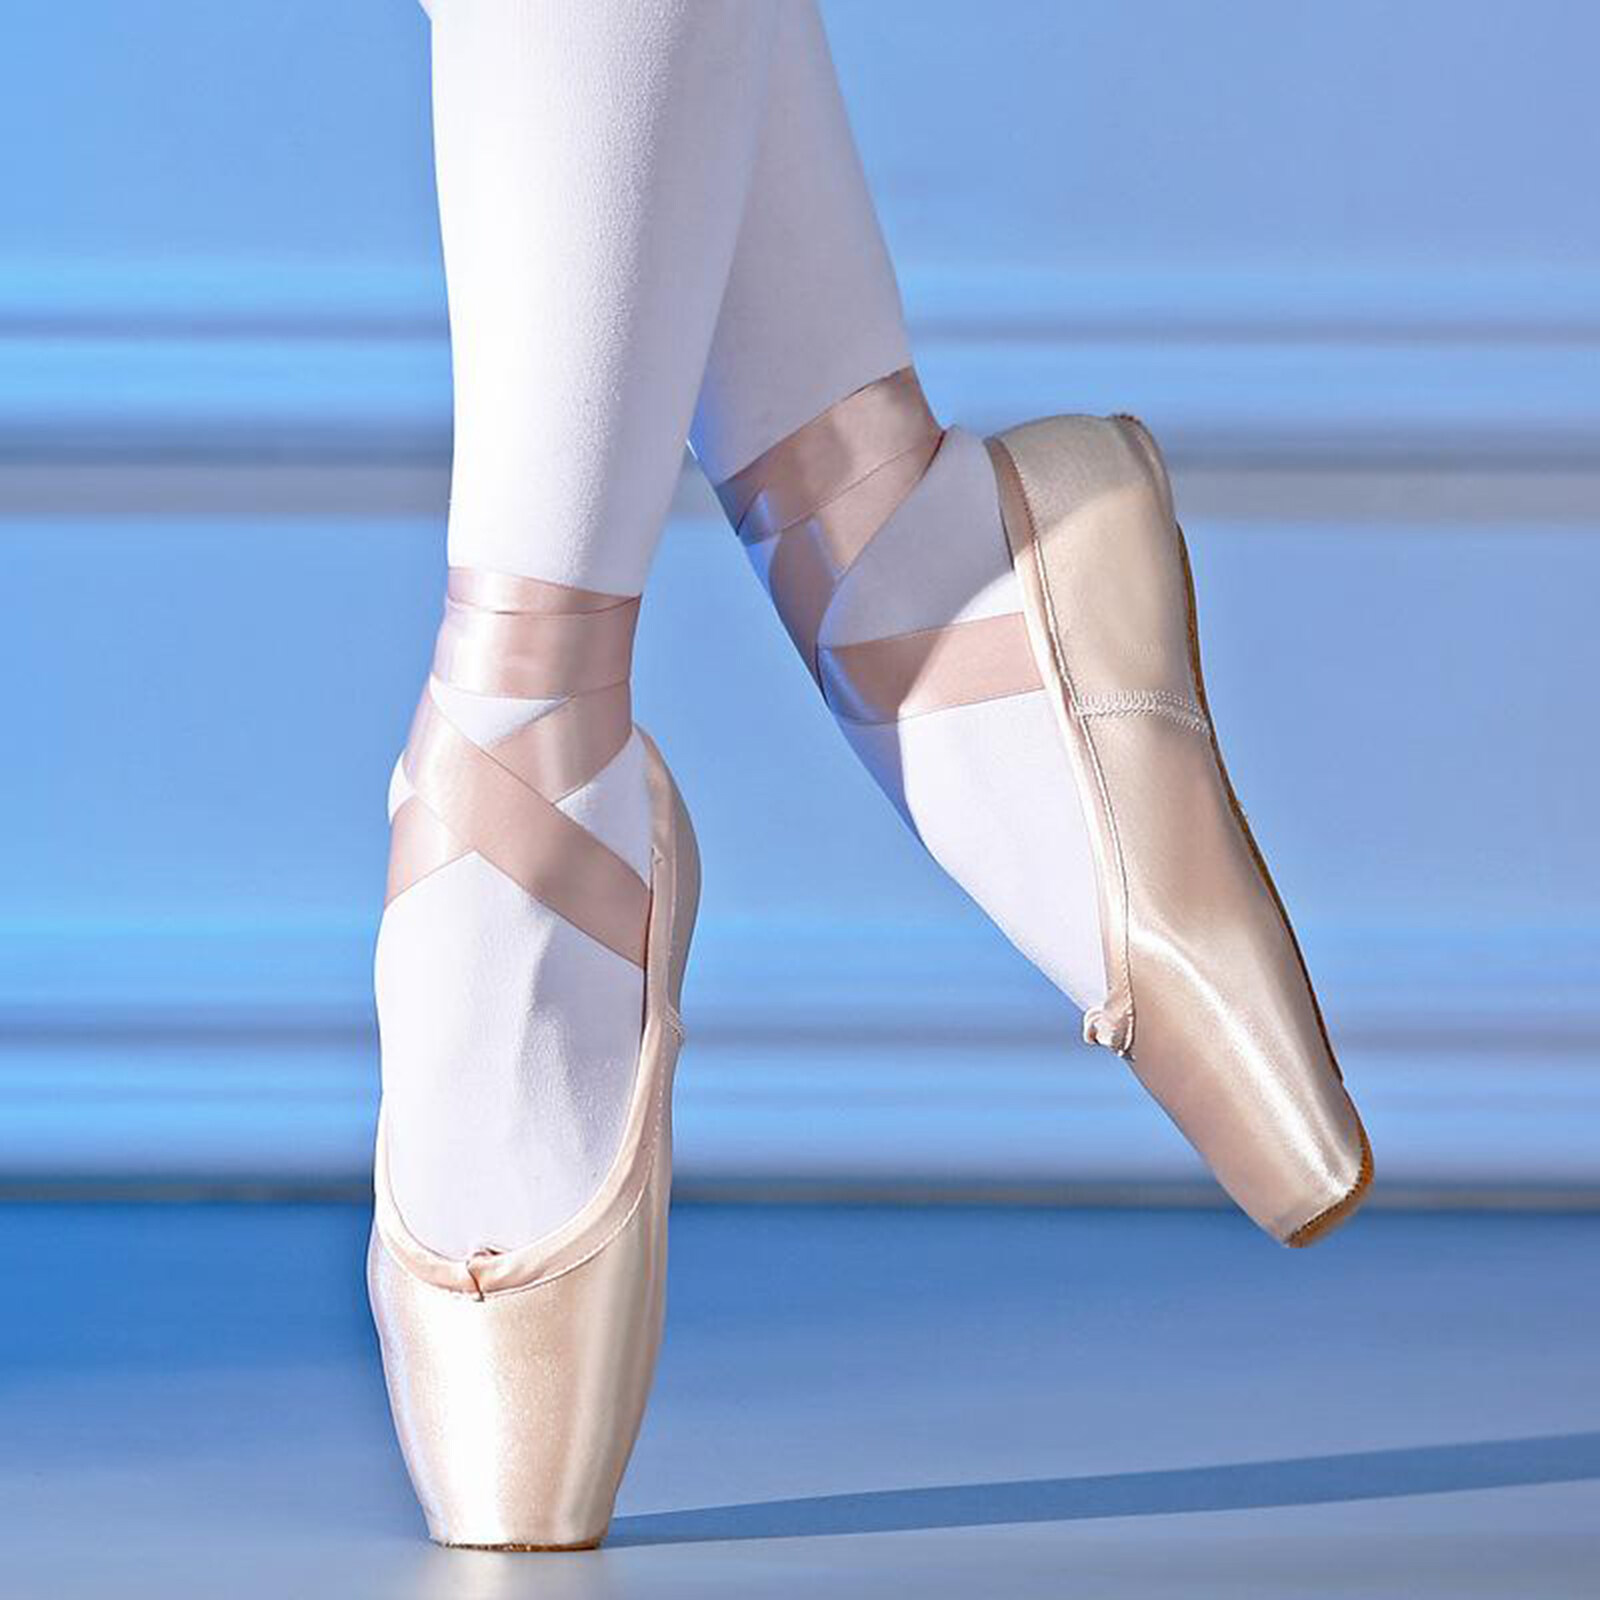 Women Girls Ballet Dance Shoes Soft Satin Pointe Suede Sole Yoga Shoes Dancewear